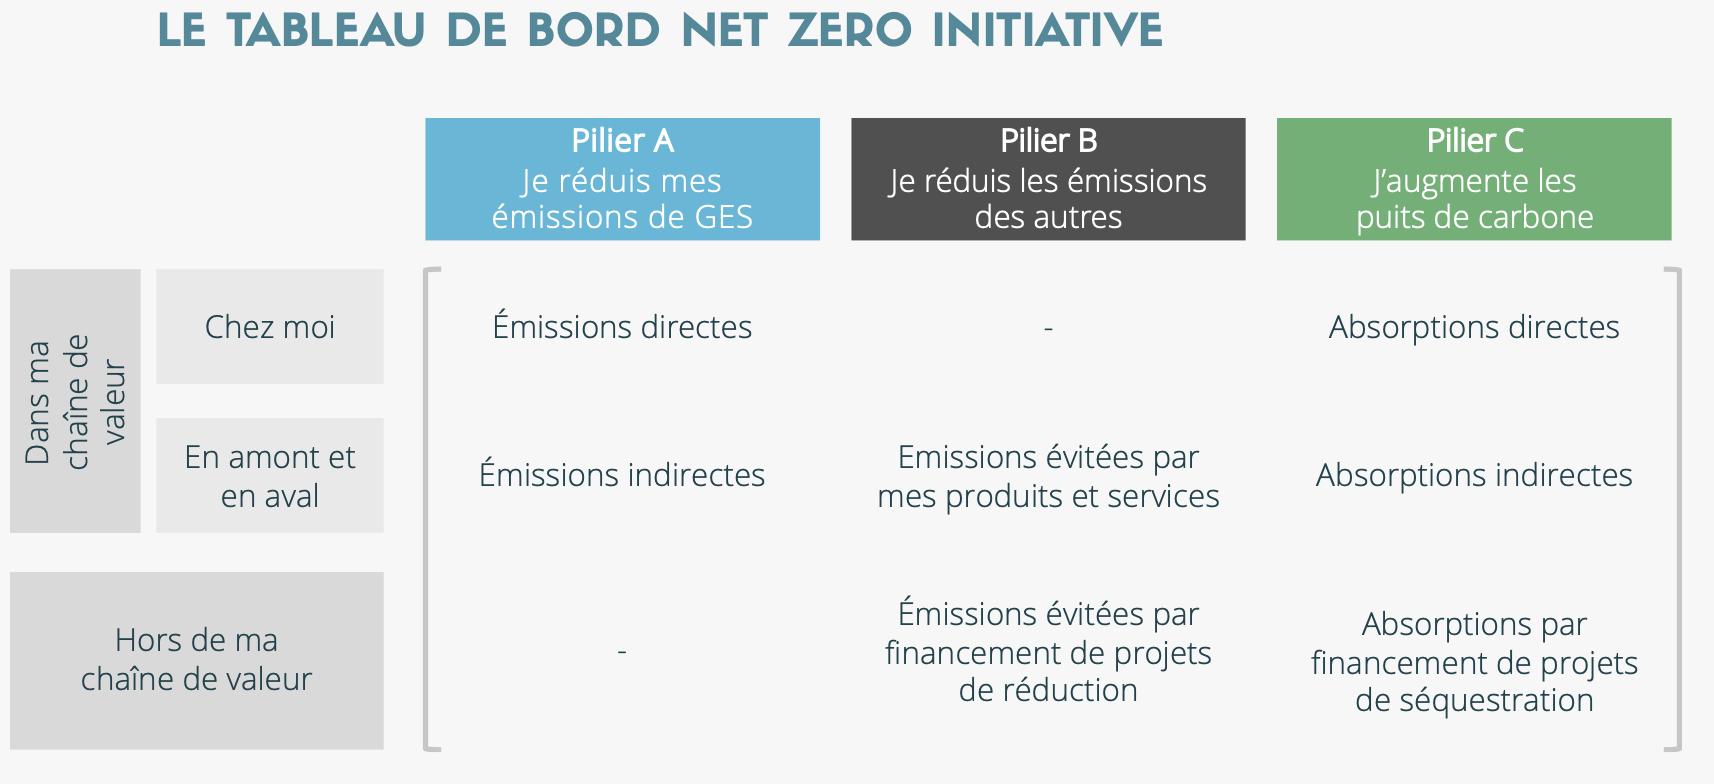 net zero initiative tableau